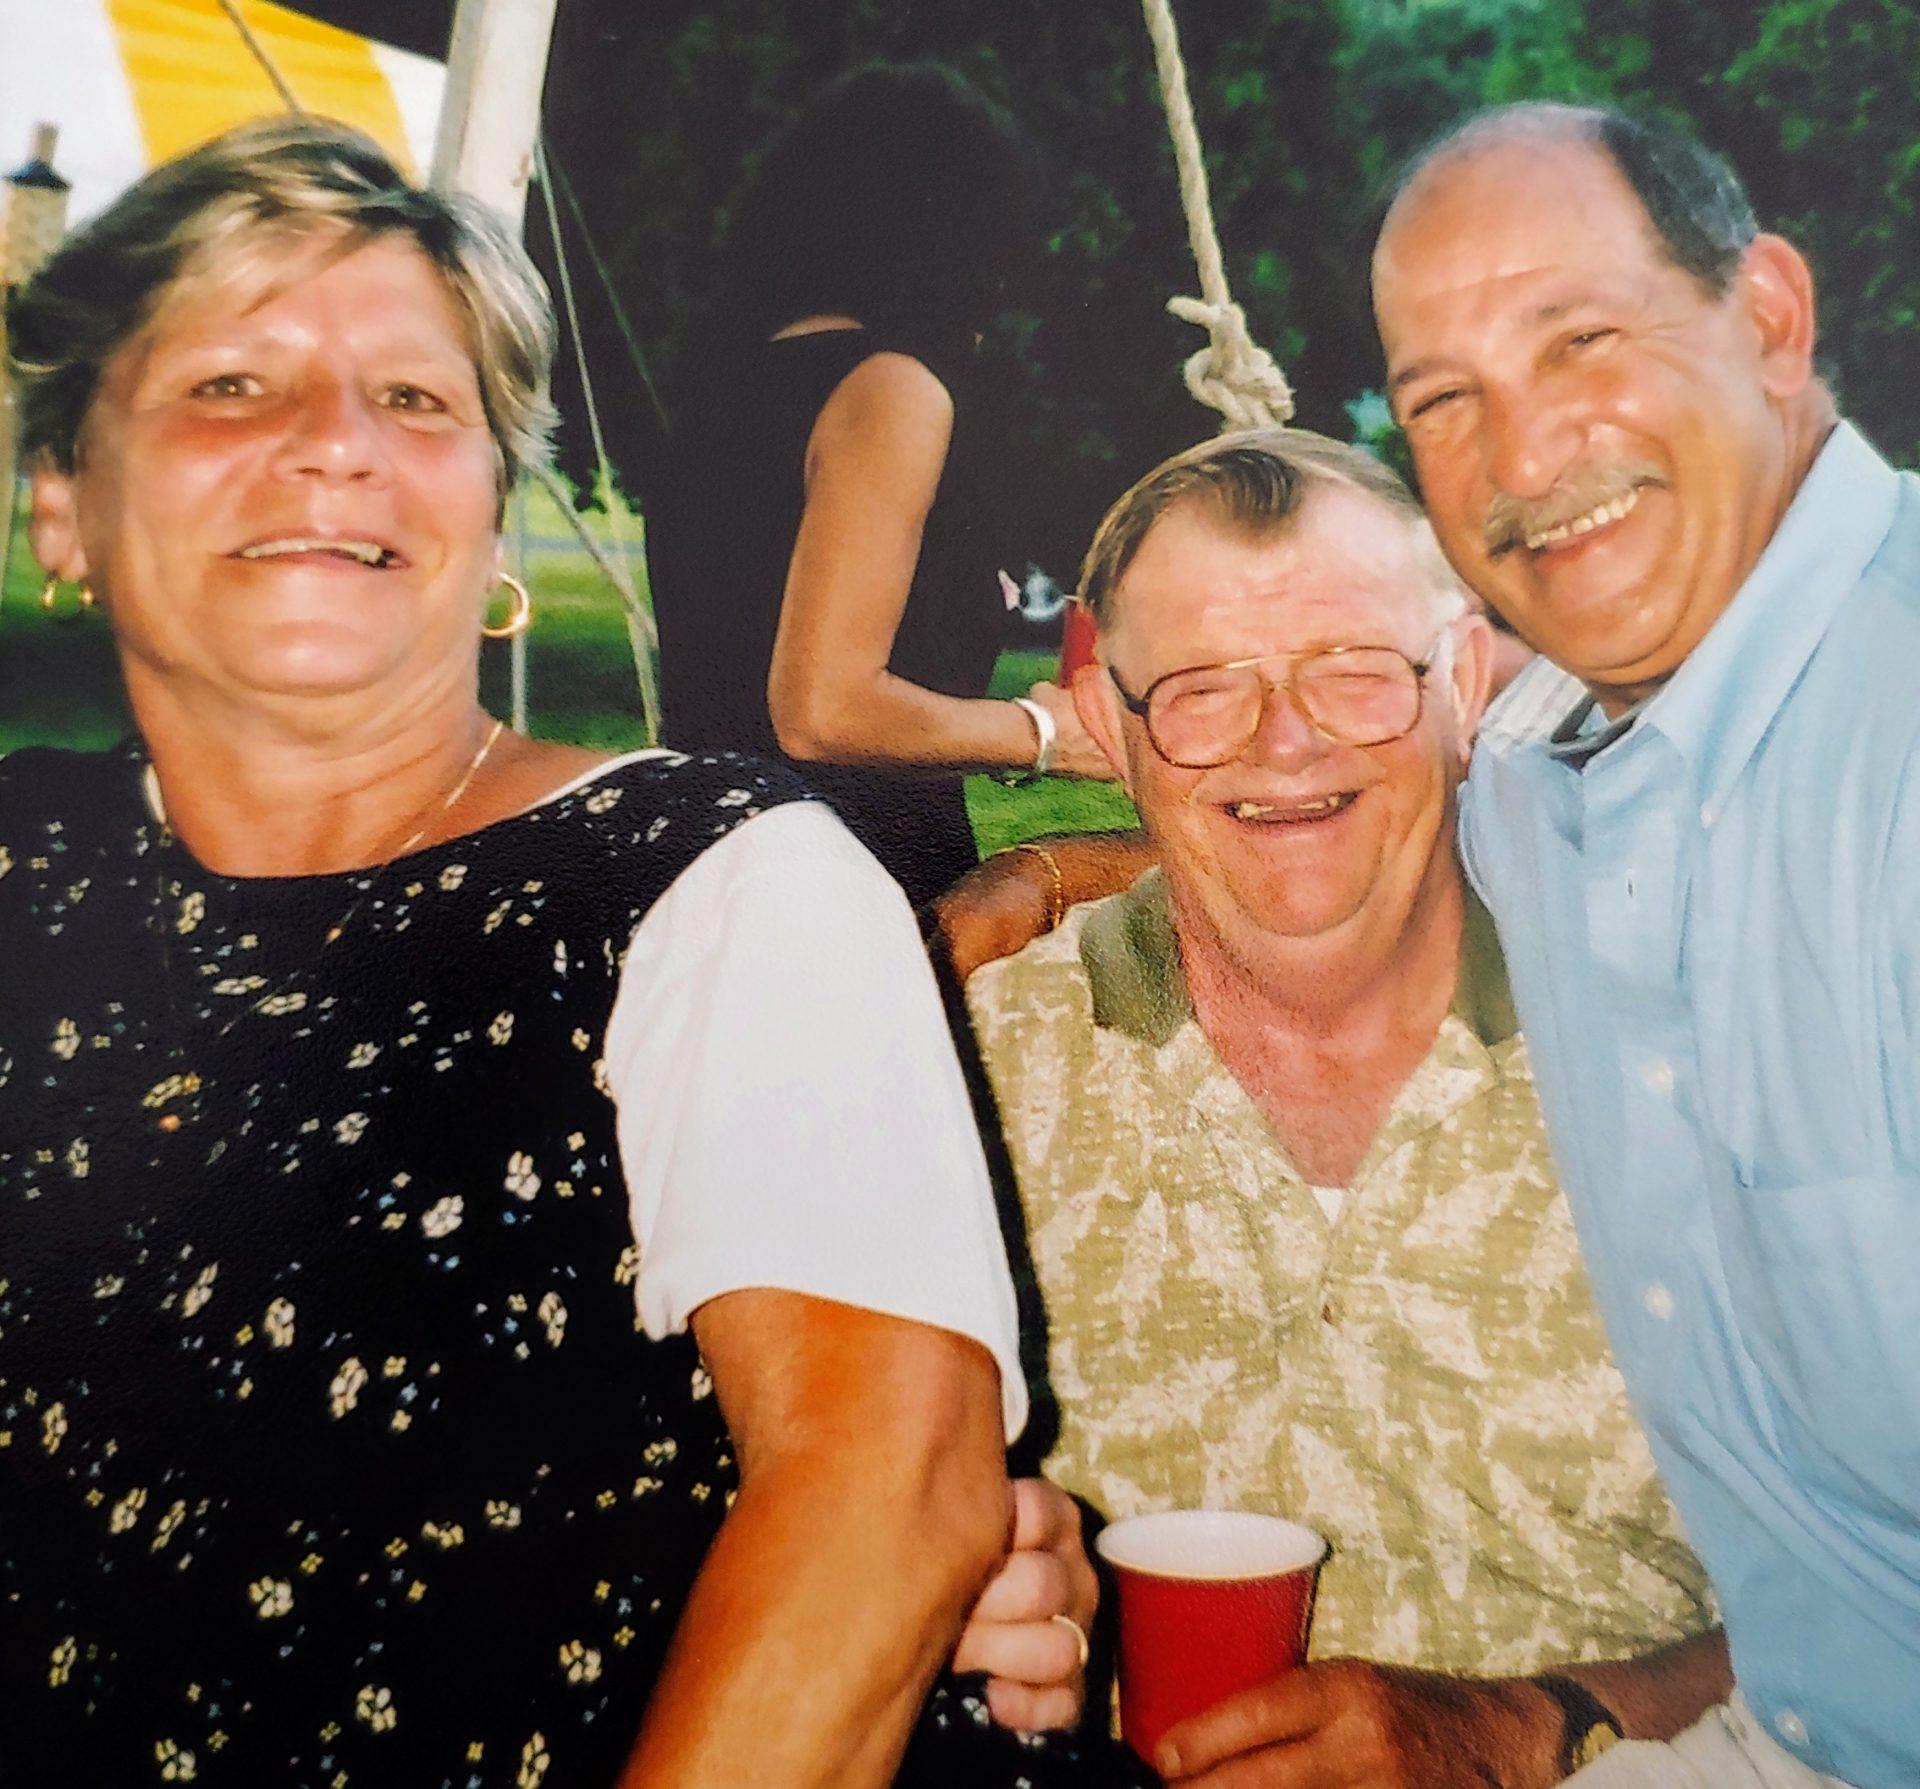 Bob with Fran and Jake. 2005